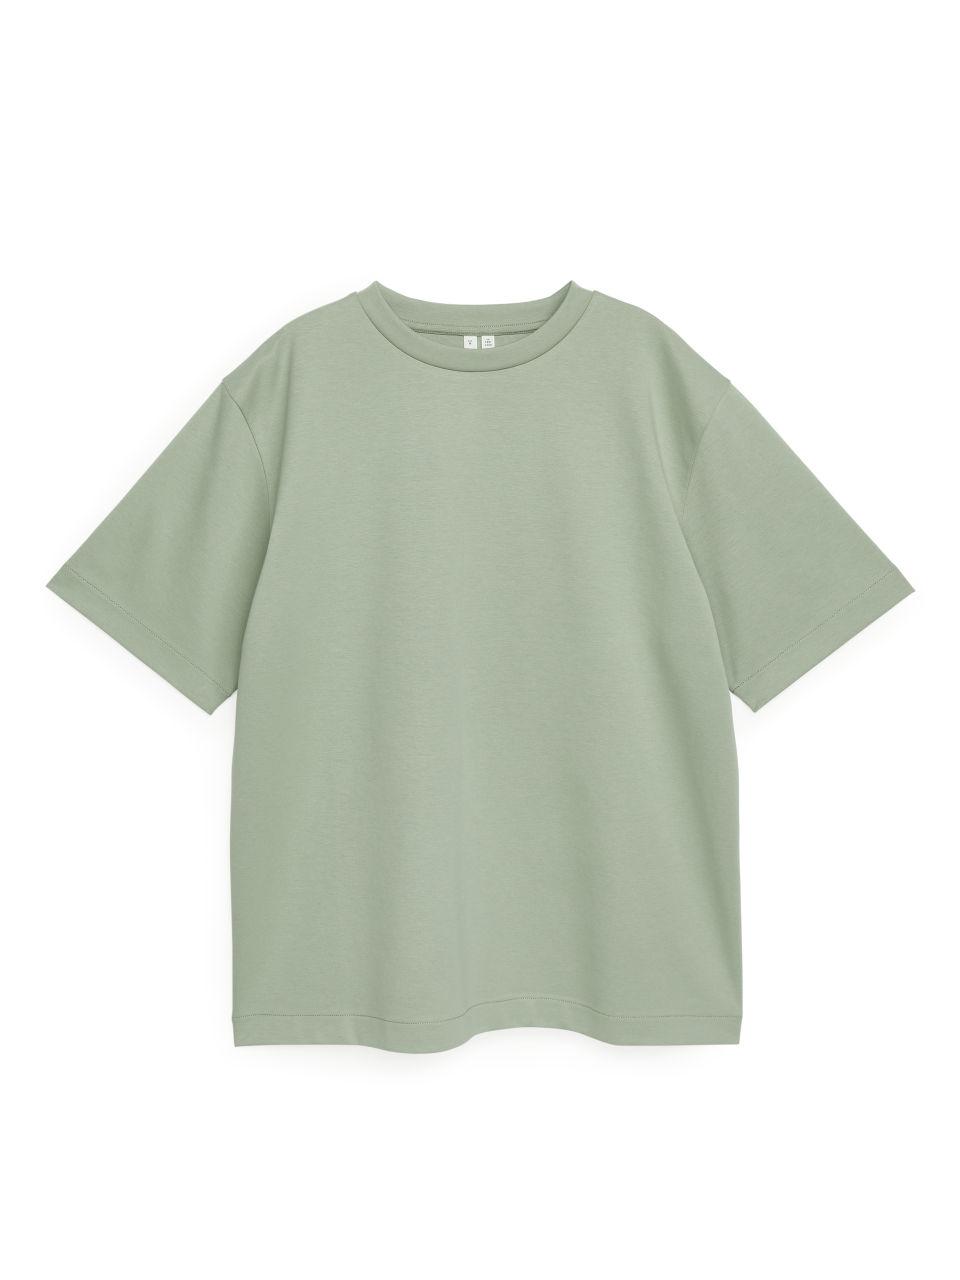 Interlock T-shirt - Green